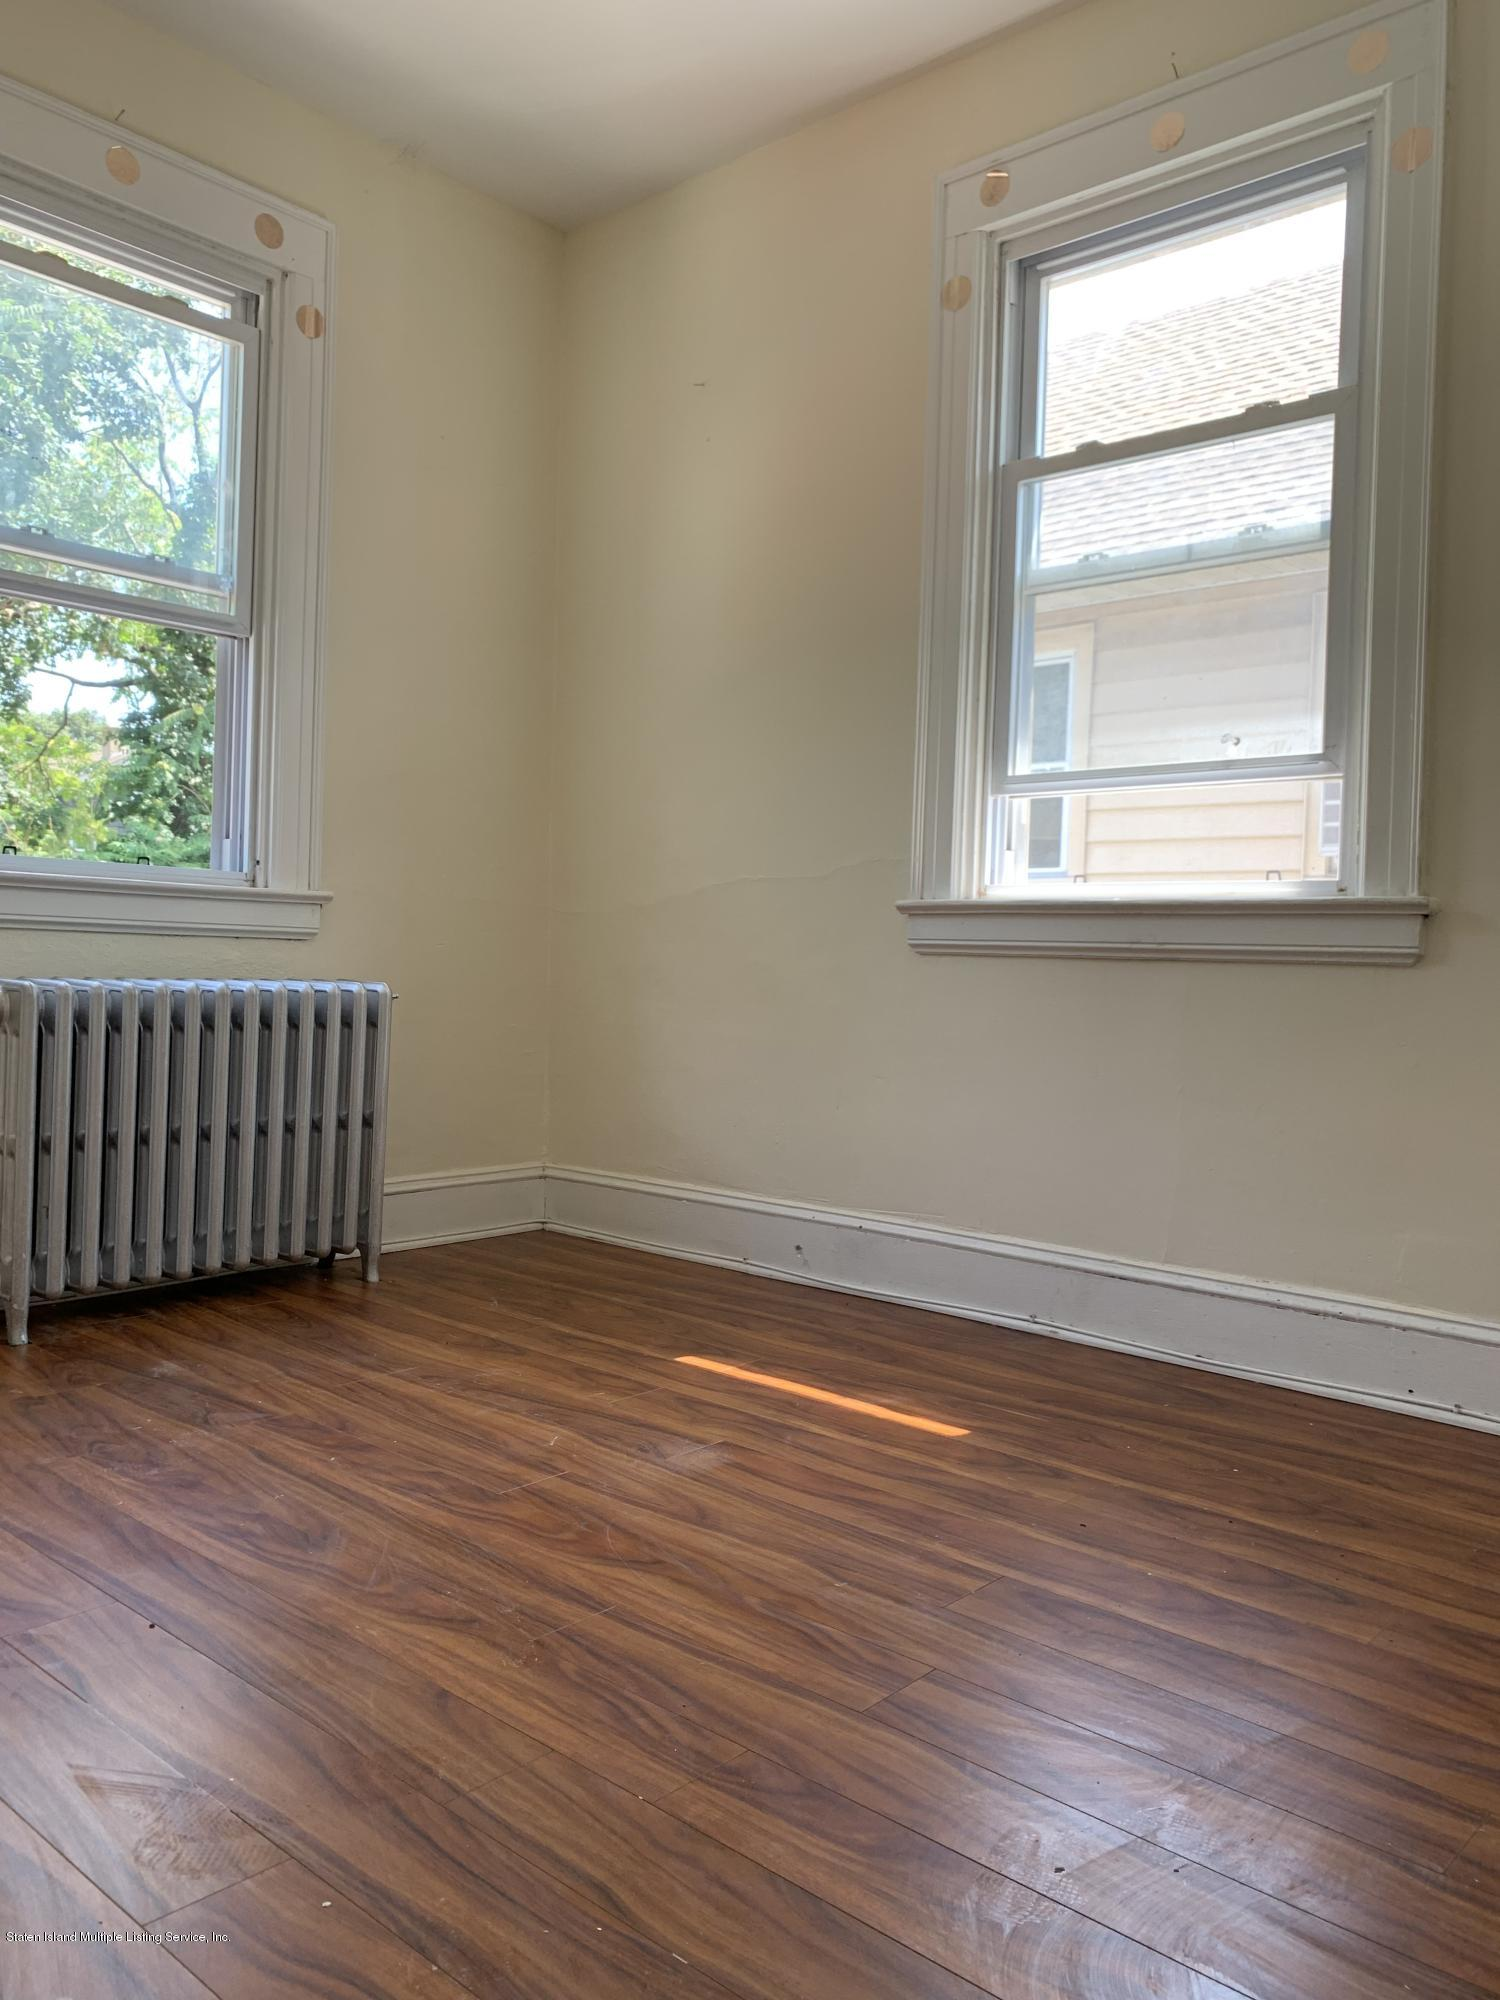 Single Family - Detached 253 Gordon Street  Staten Island, NY 10304, MLS-1131162-24